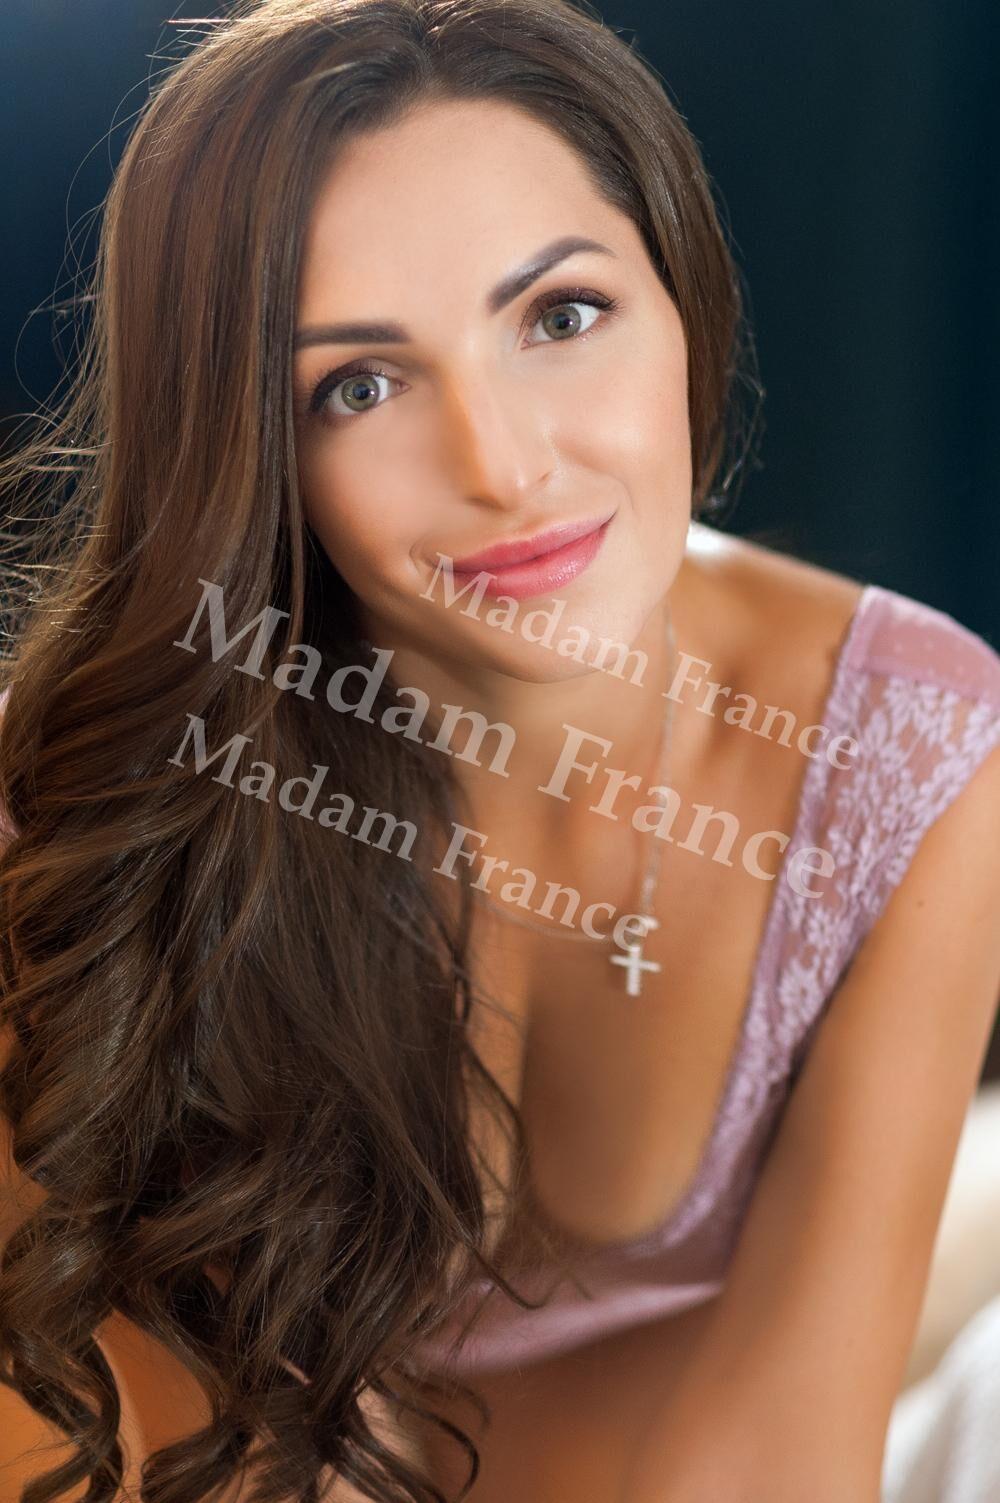 Elina model on Madam France escort service